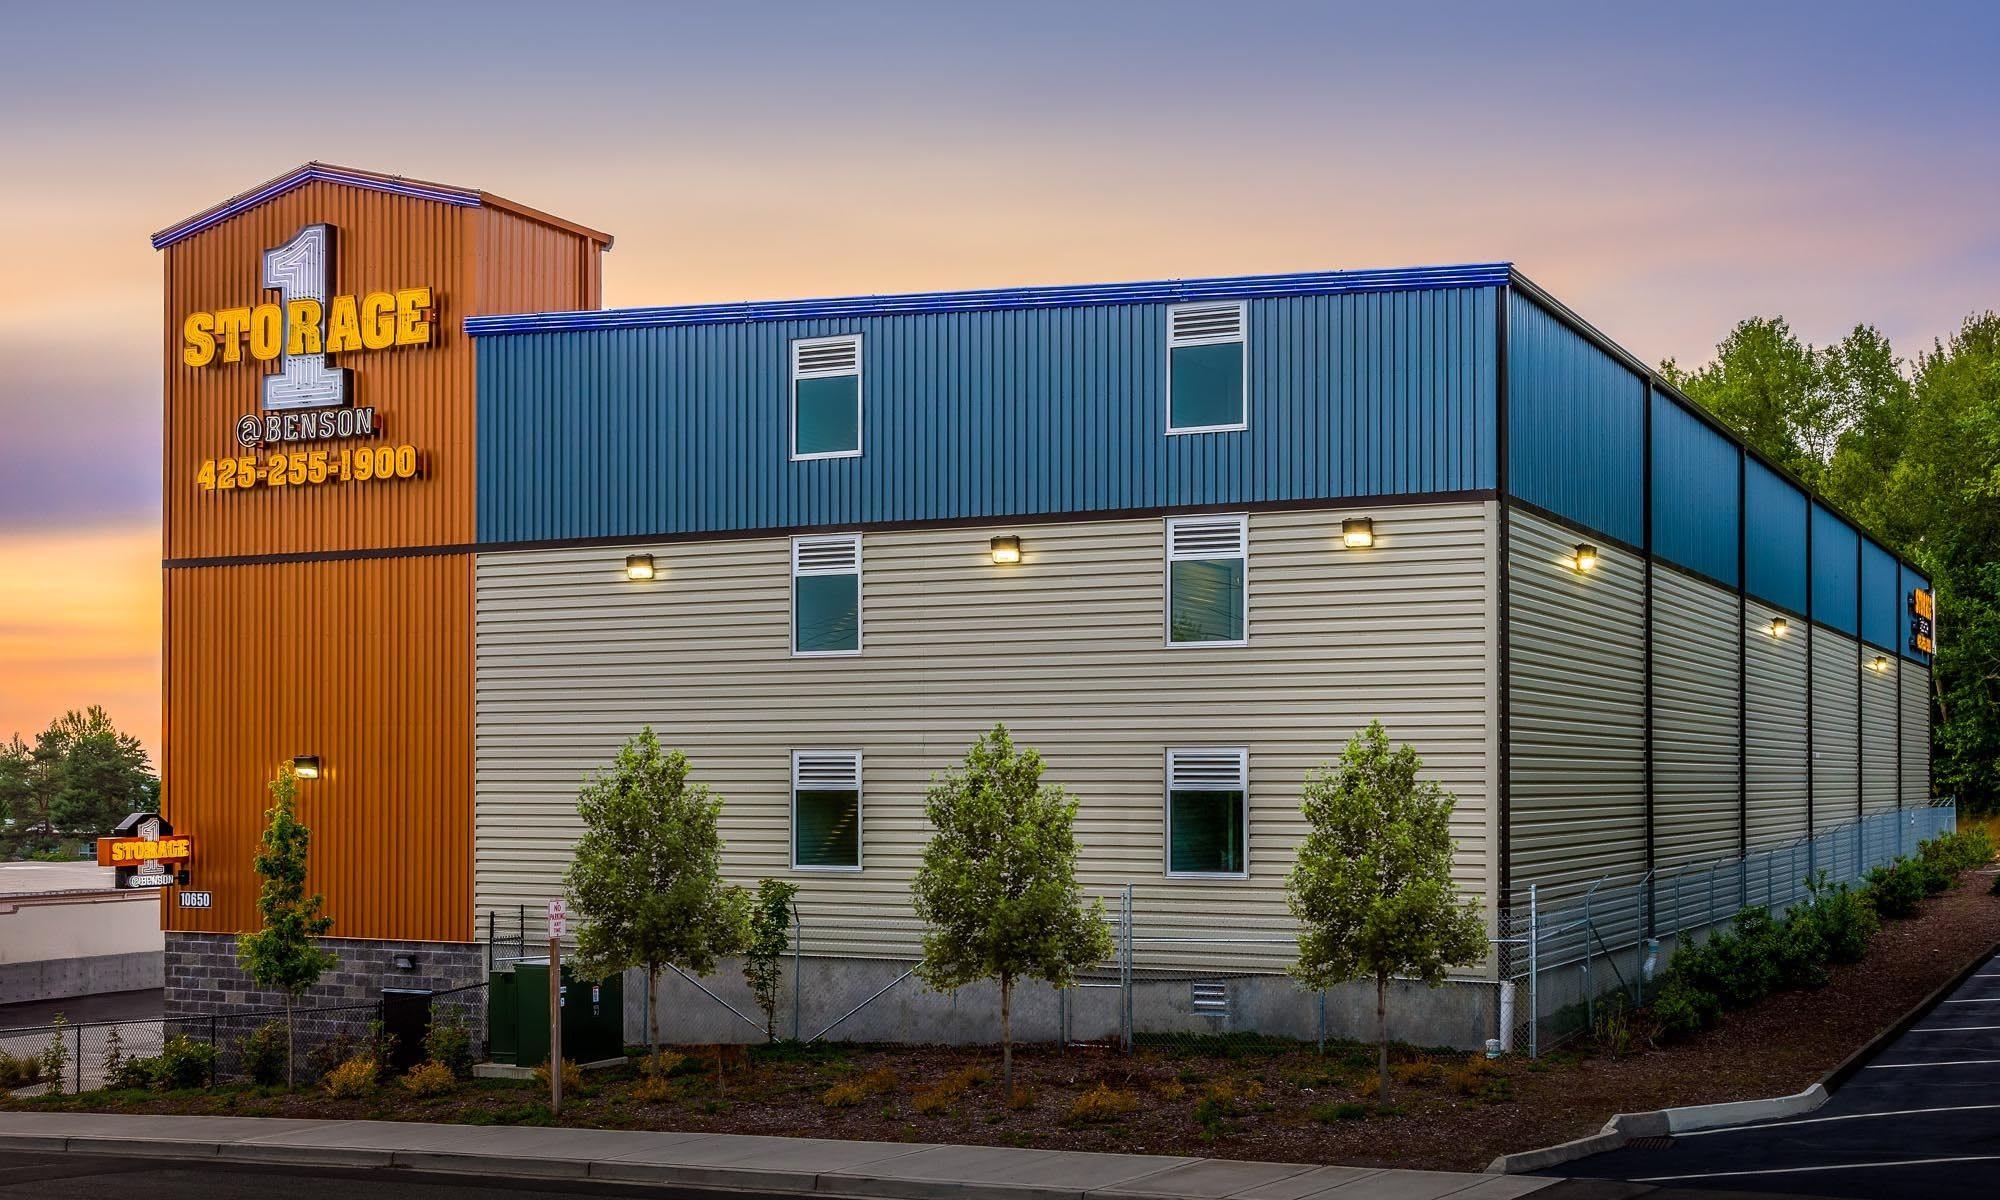 Easily recognizable exterior of self storage in Renton, Washington